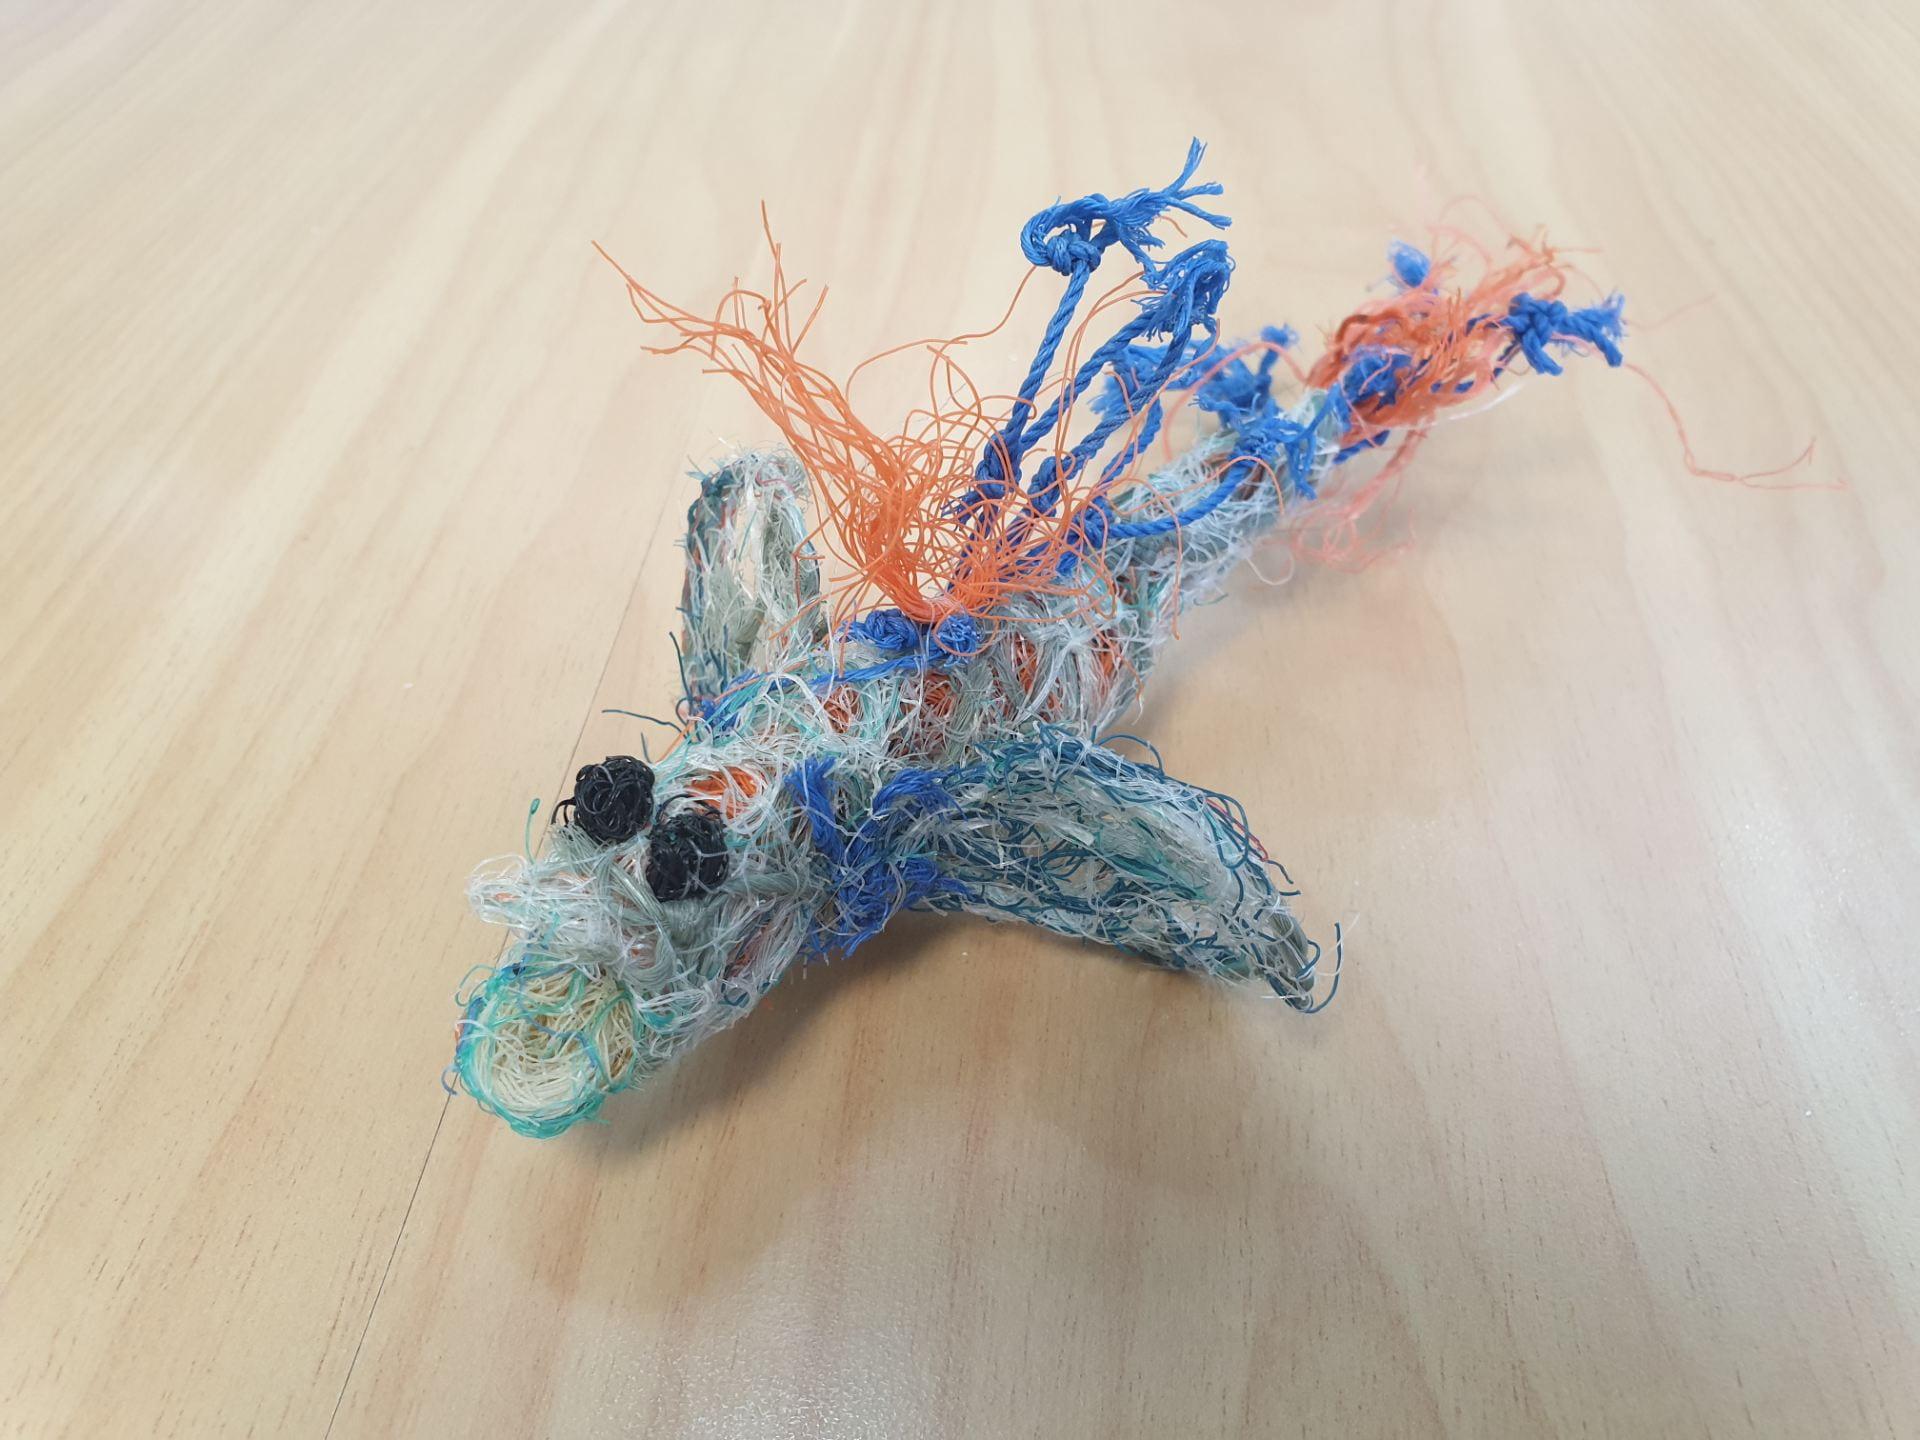 A mudskipper fish made from plastic fishing nets